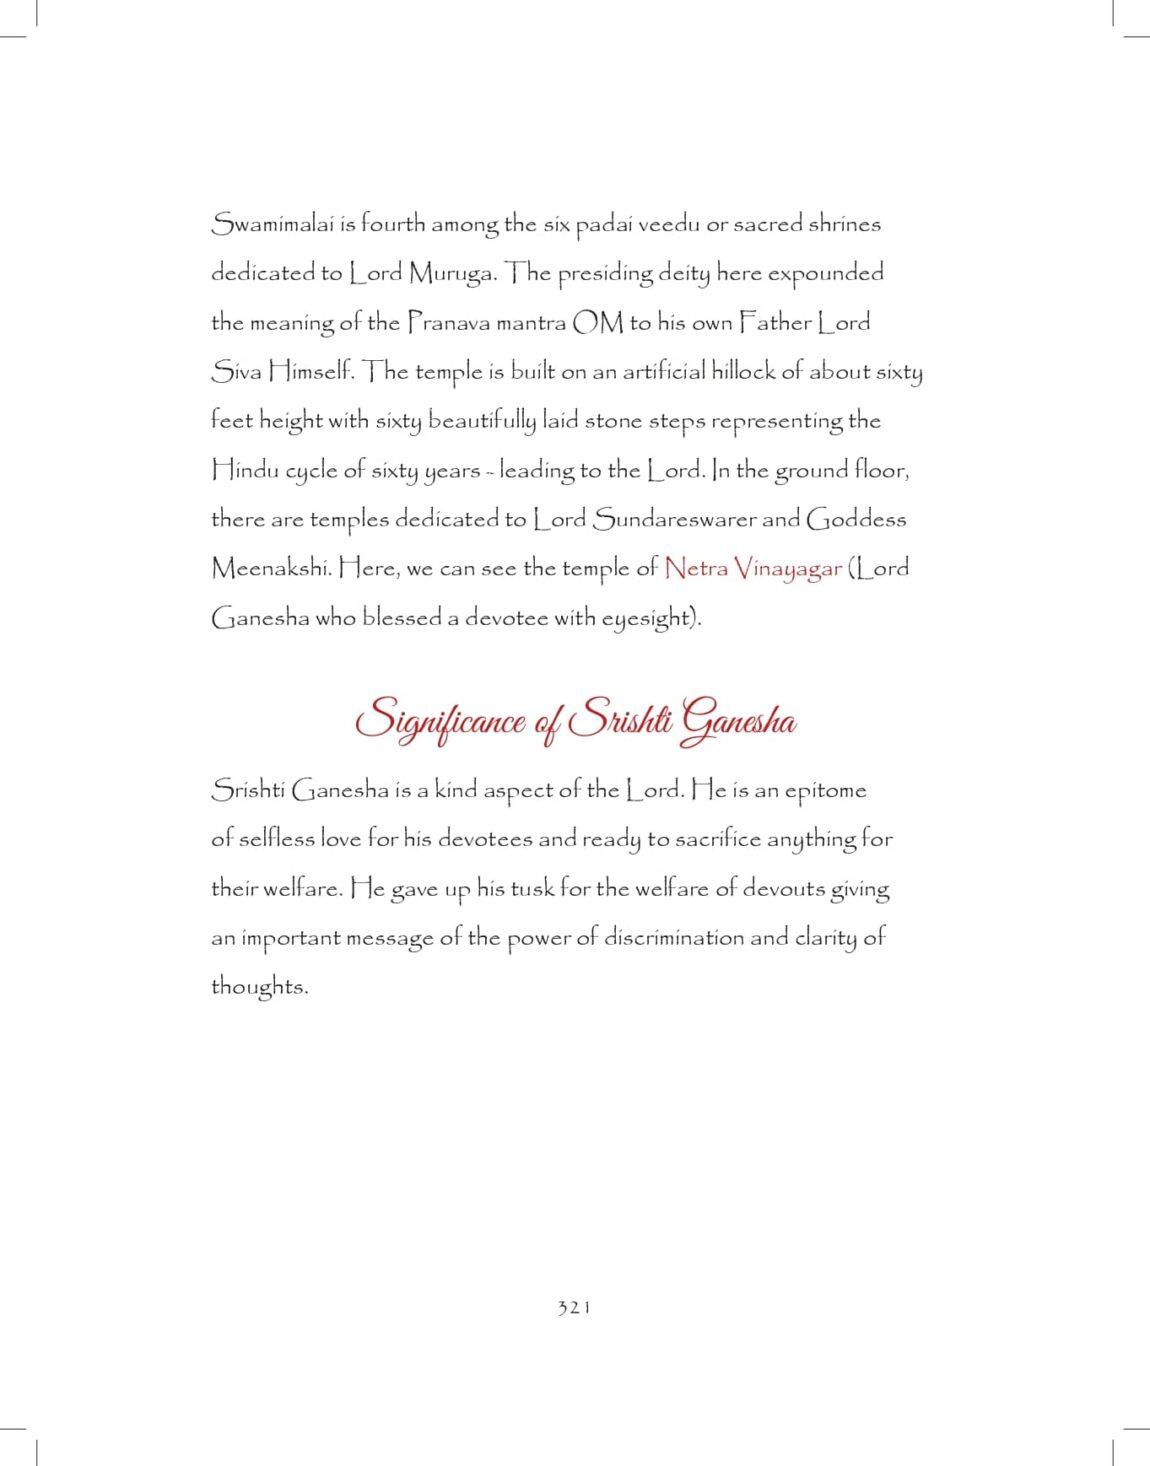 Ganesh-print_pages-to-jpg-0321.jpg